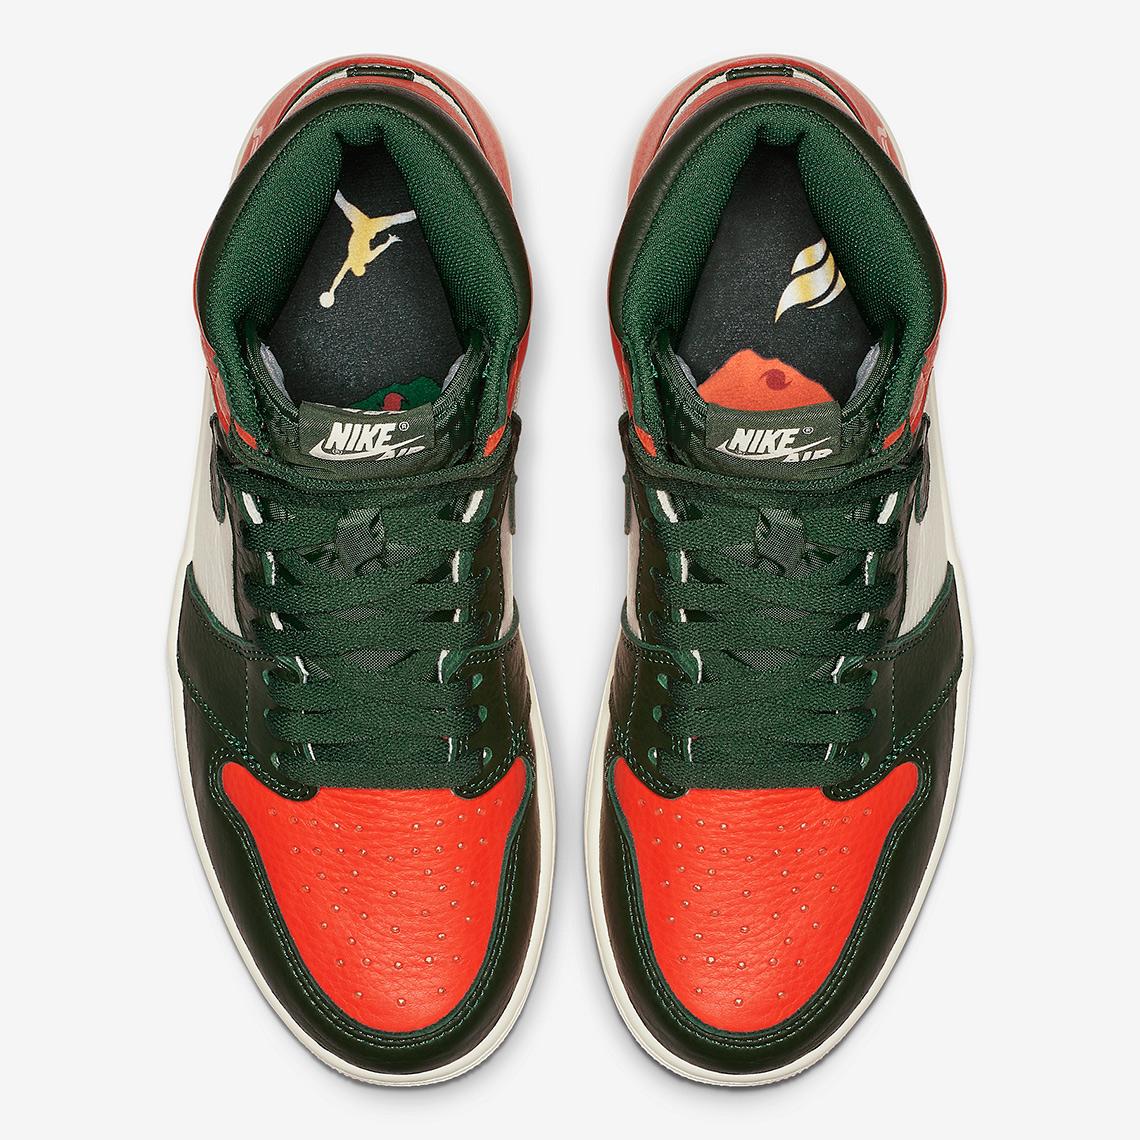 3b35b2db20ebeb SoleFly x Air Jordan 1 Retro High OG Release Date  December 8th